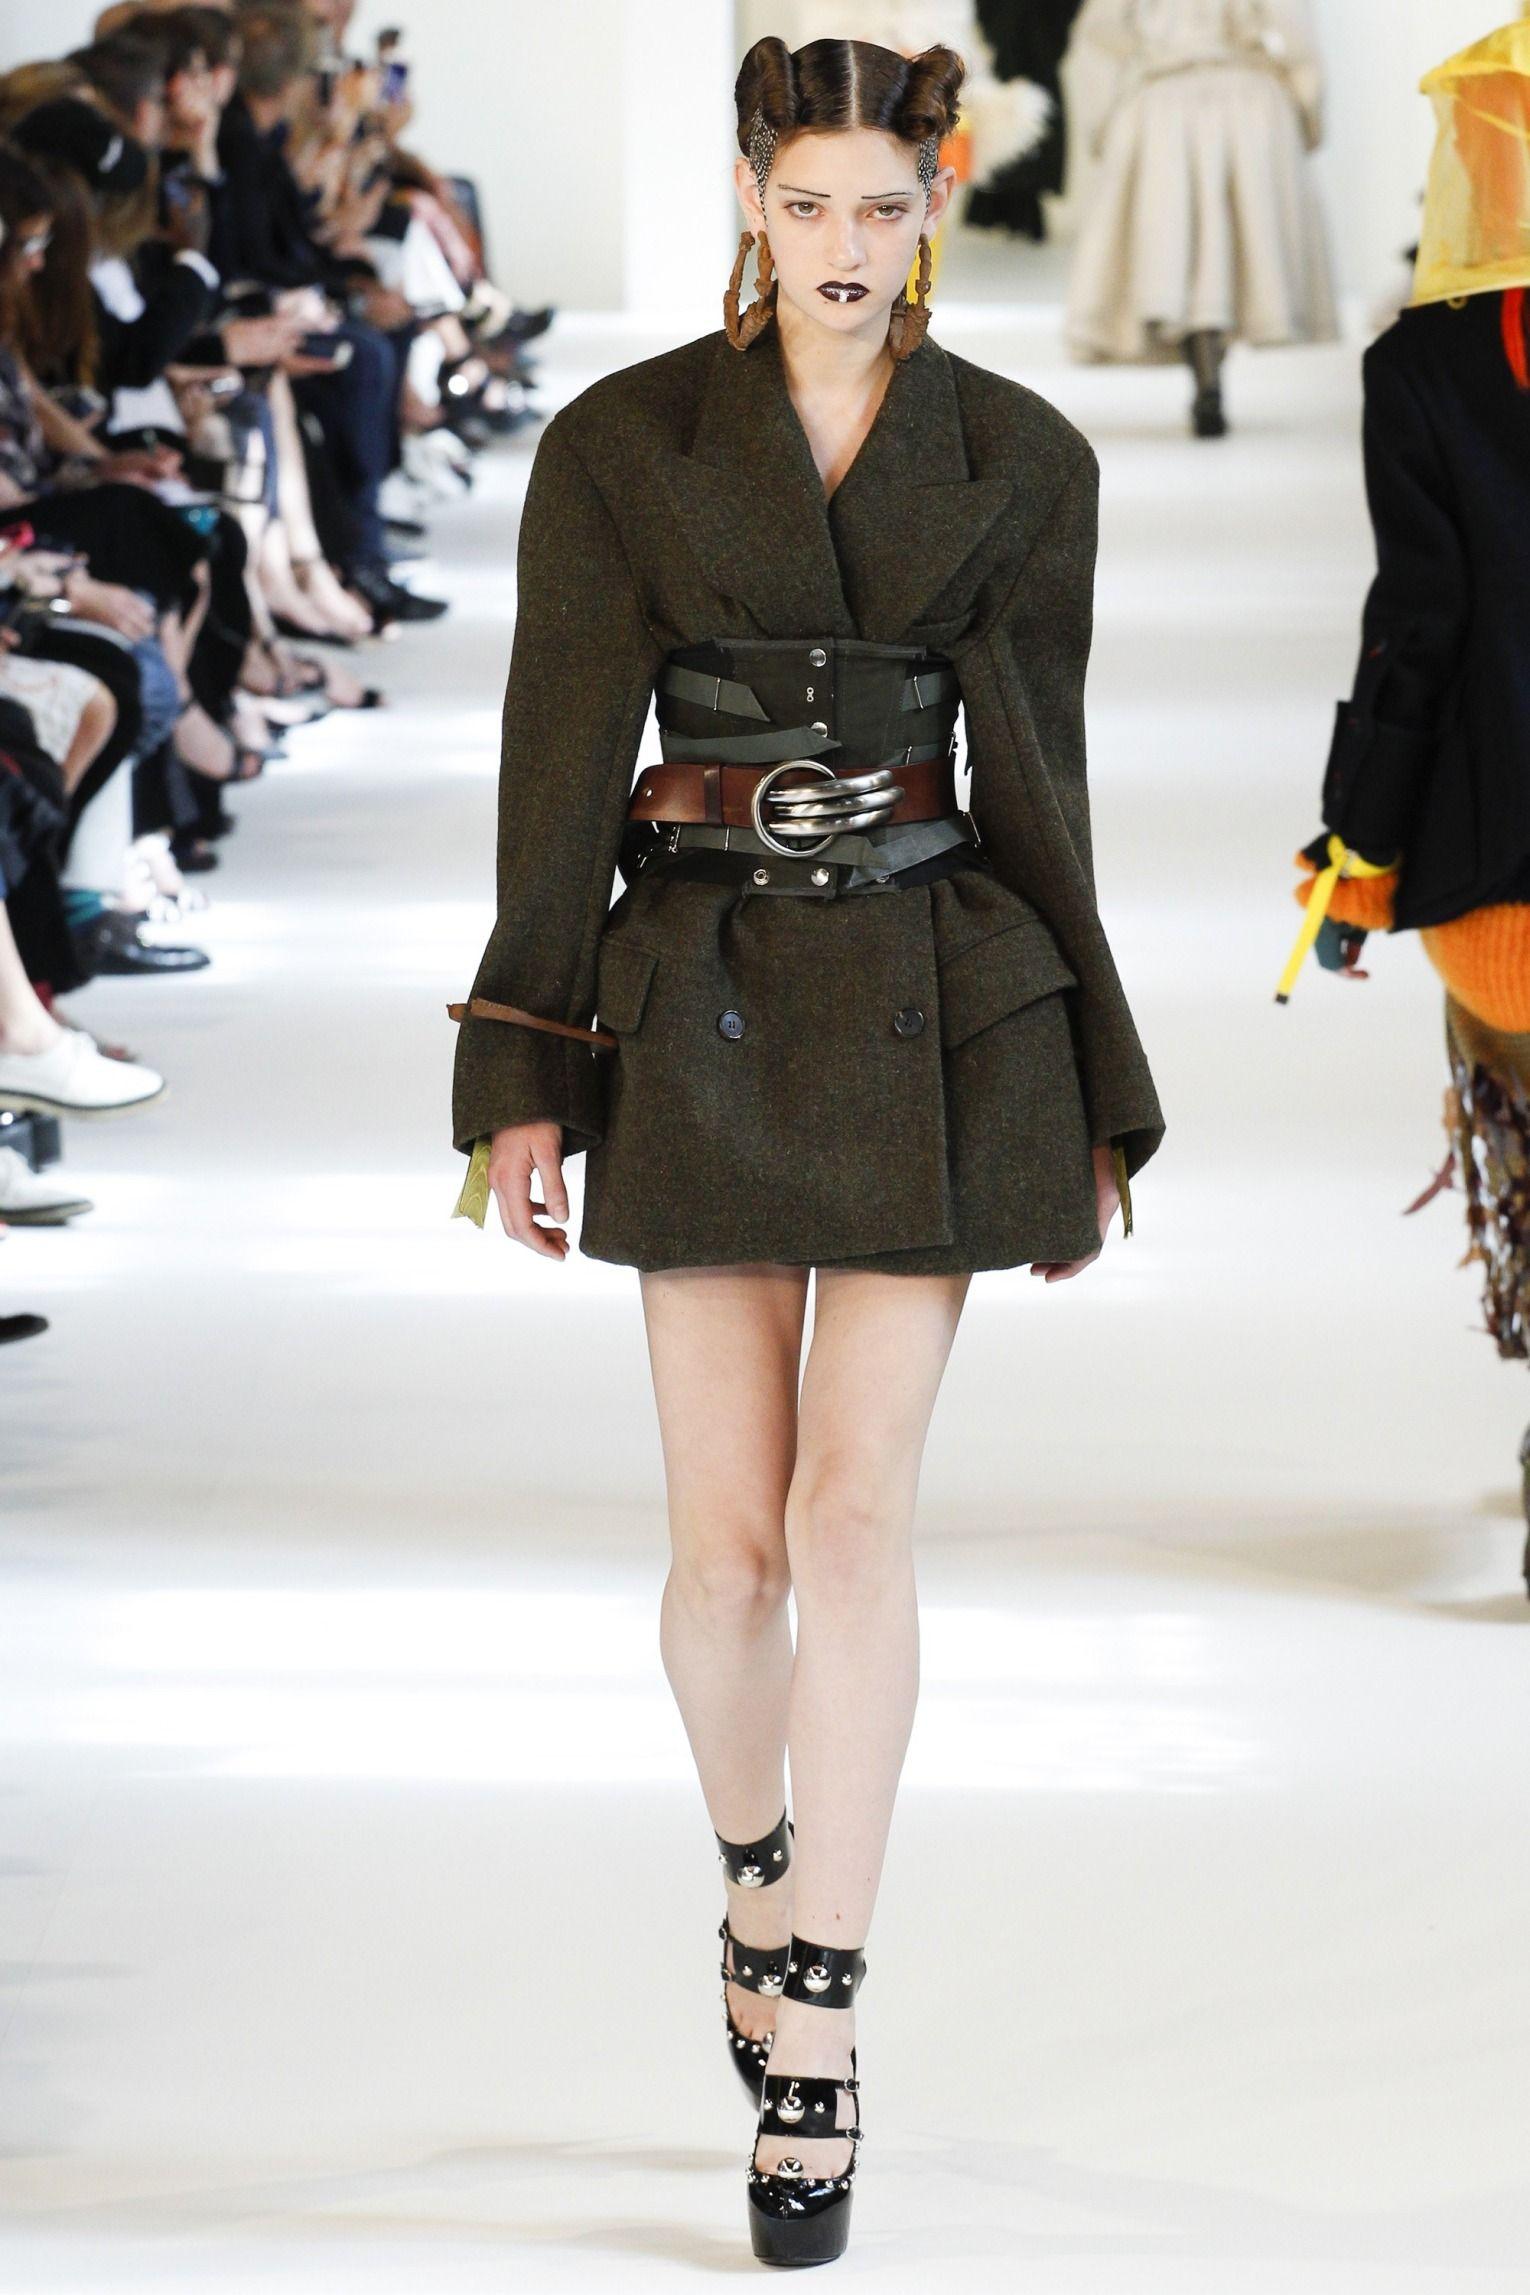 Fashion week Martin maison margiela fall couture for girls